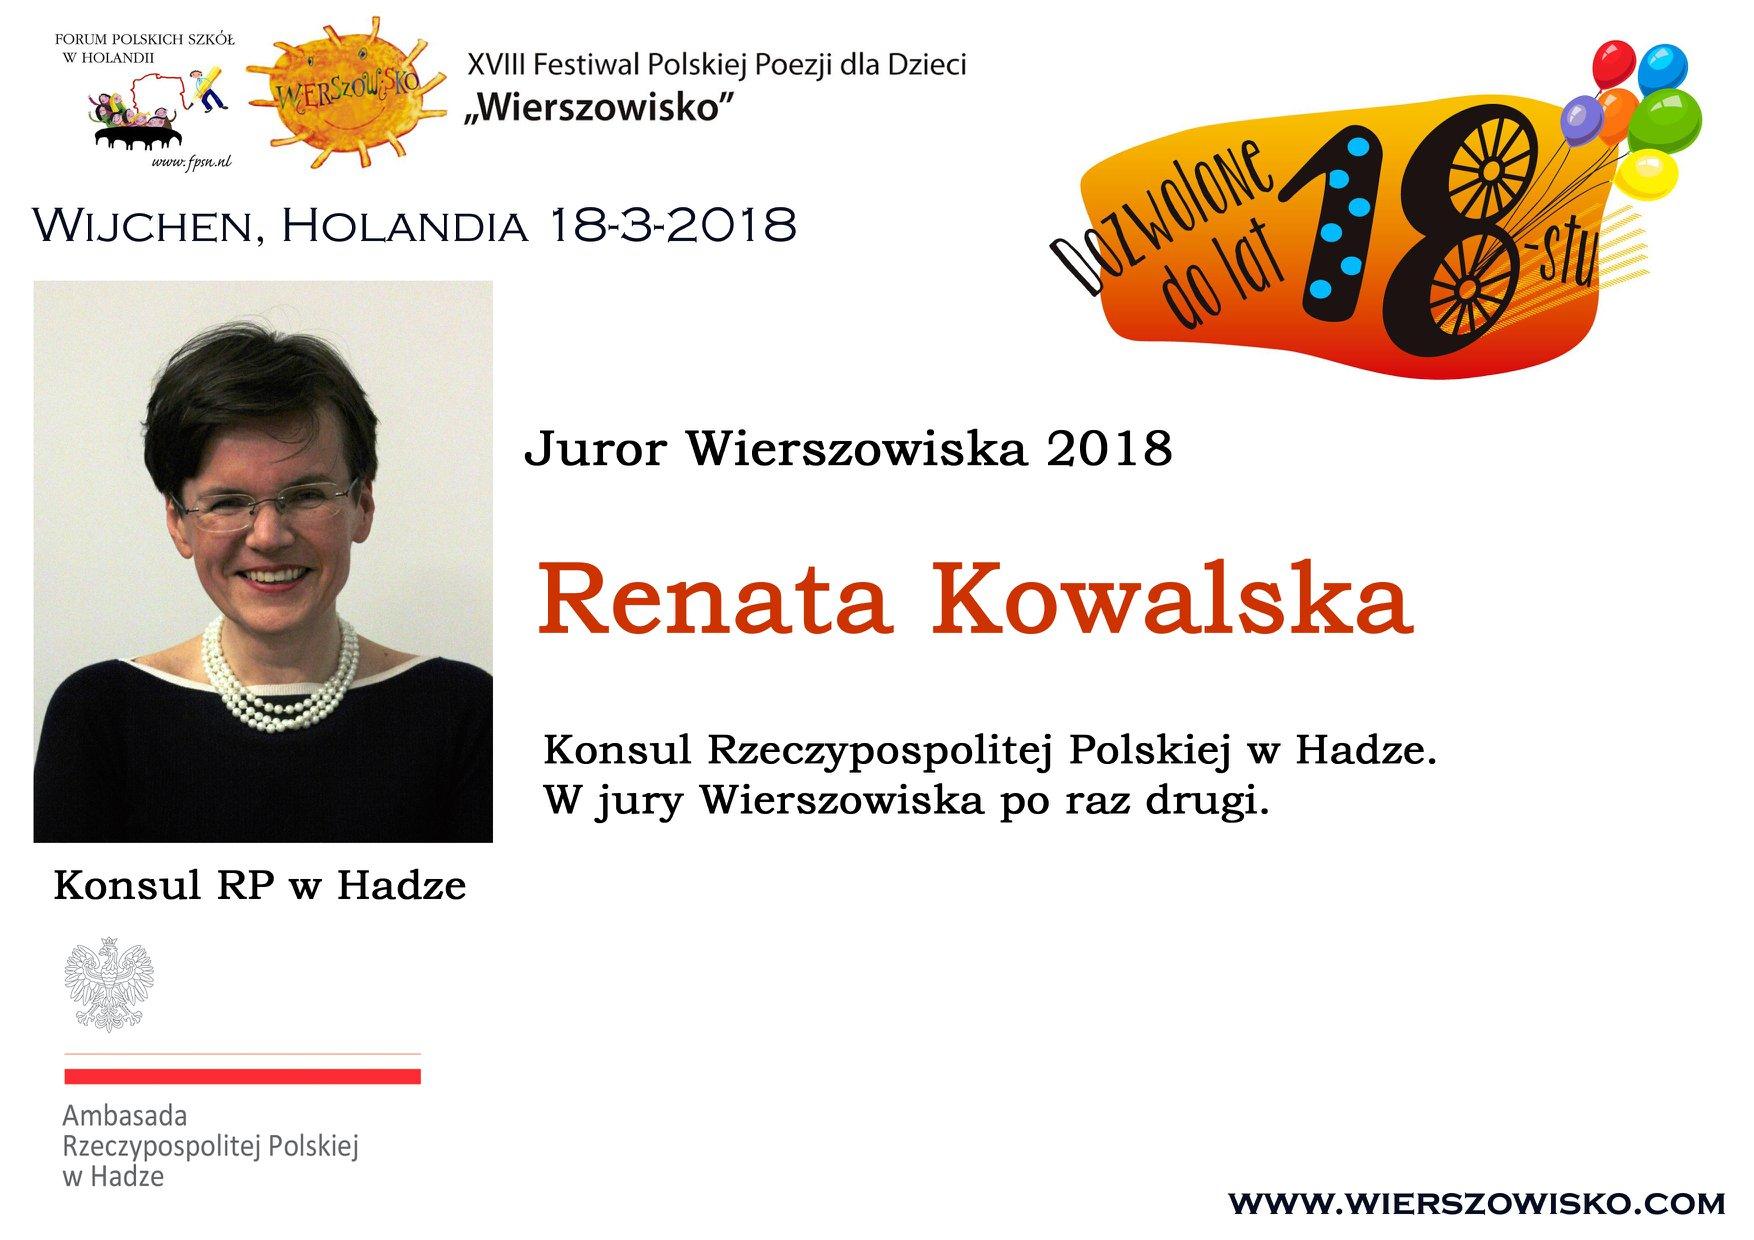 3. Renata Kowalska